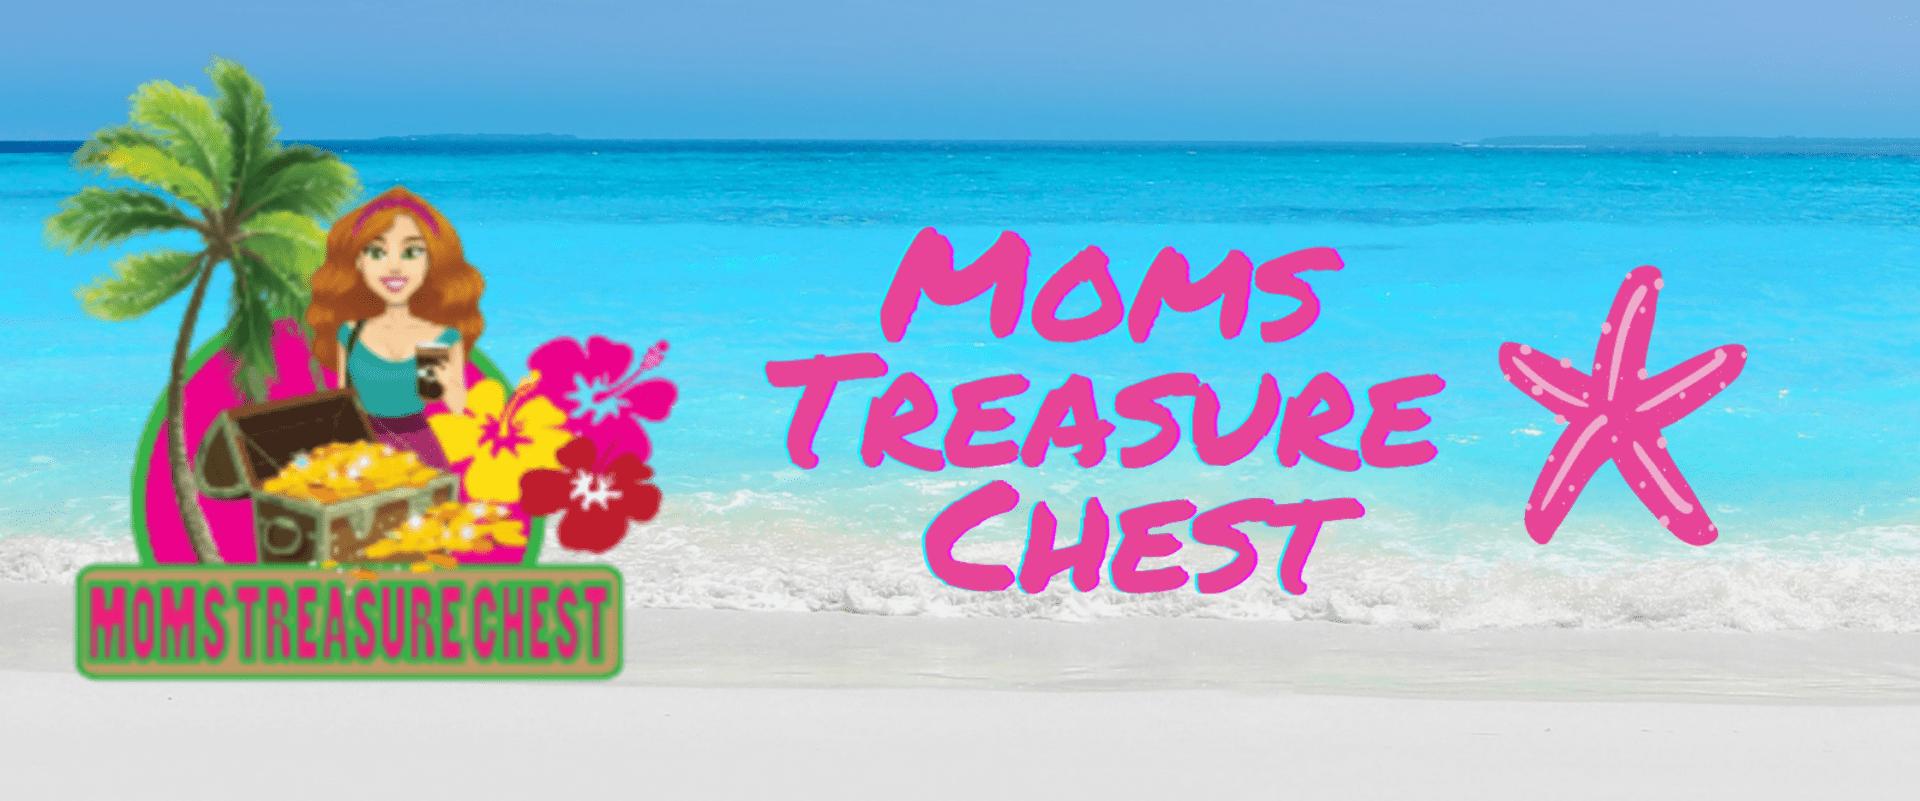 Moms Treasure Chest